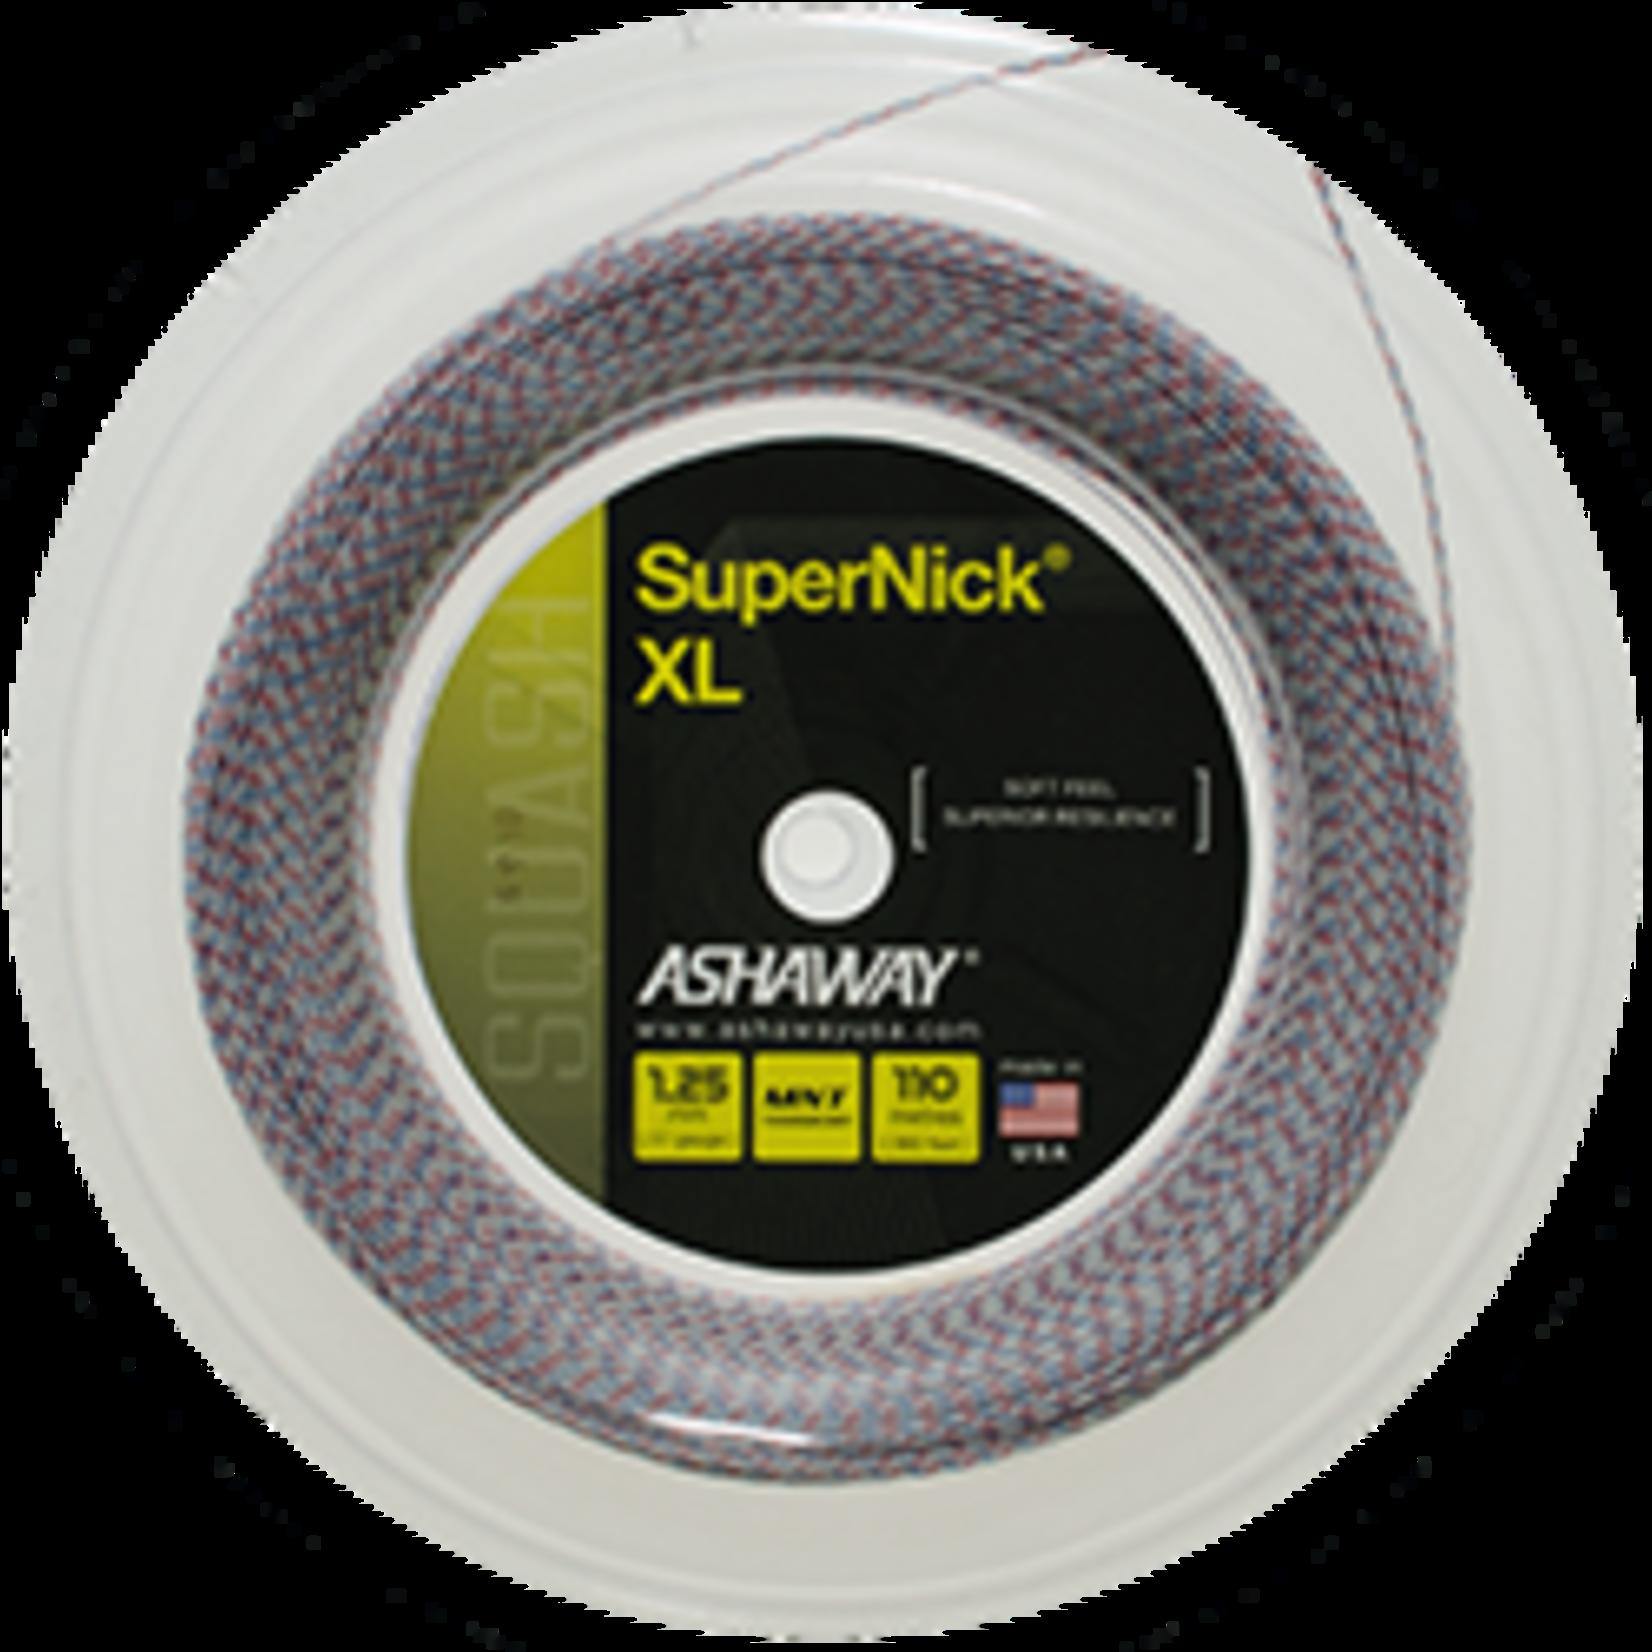 Ashaway SuperNick XL Squash 1,25mm